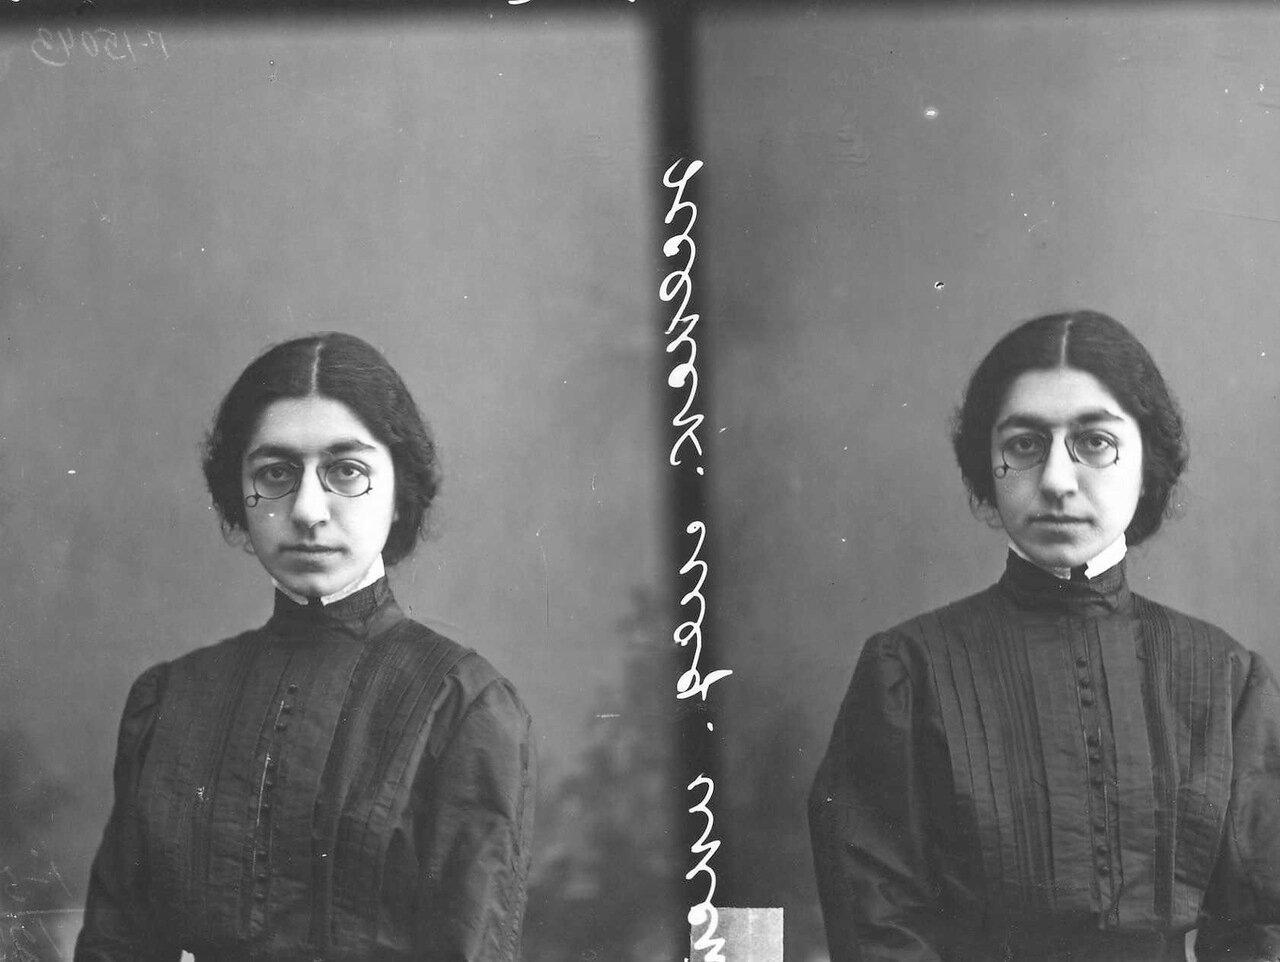 Мелихова - студентка женского медицинского института